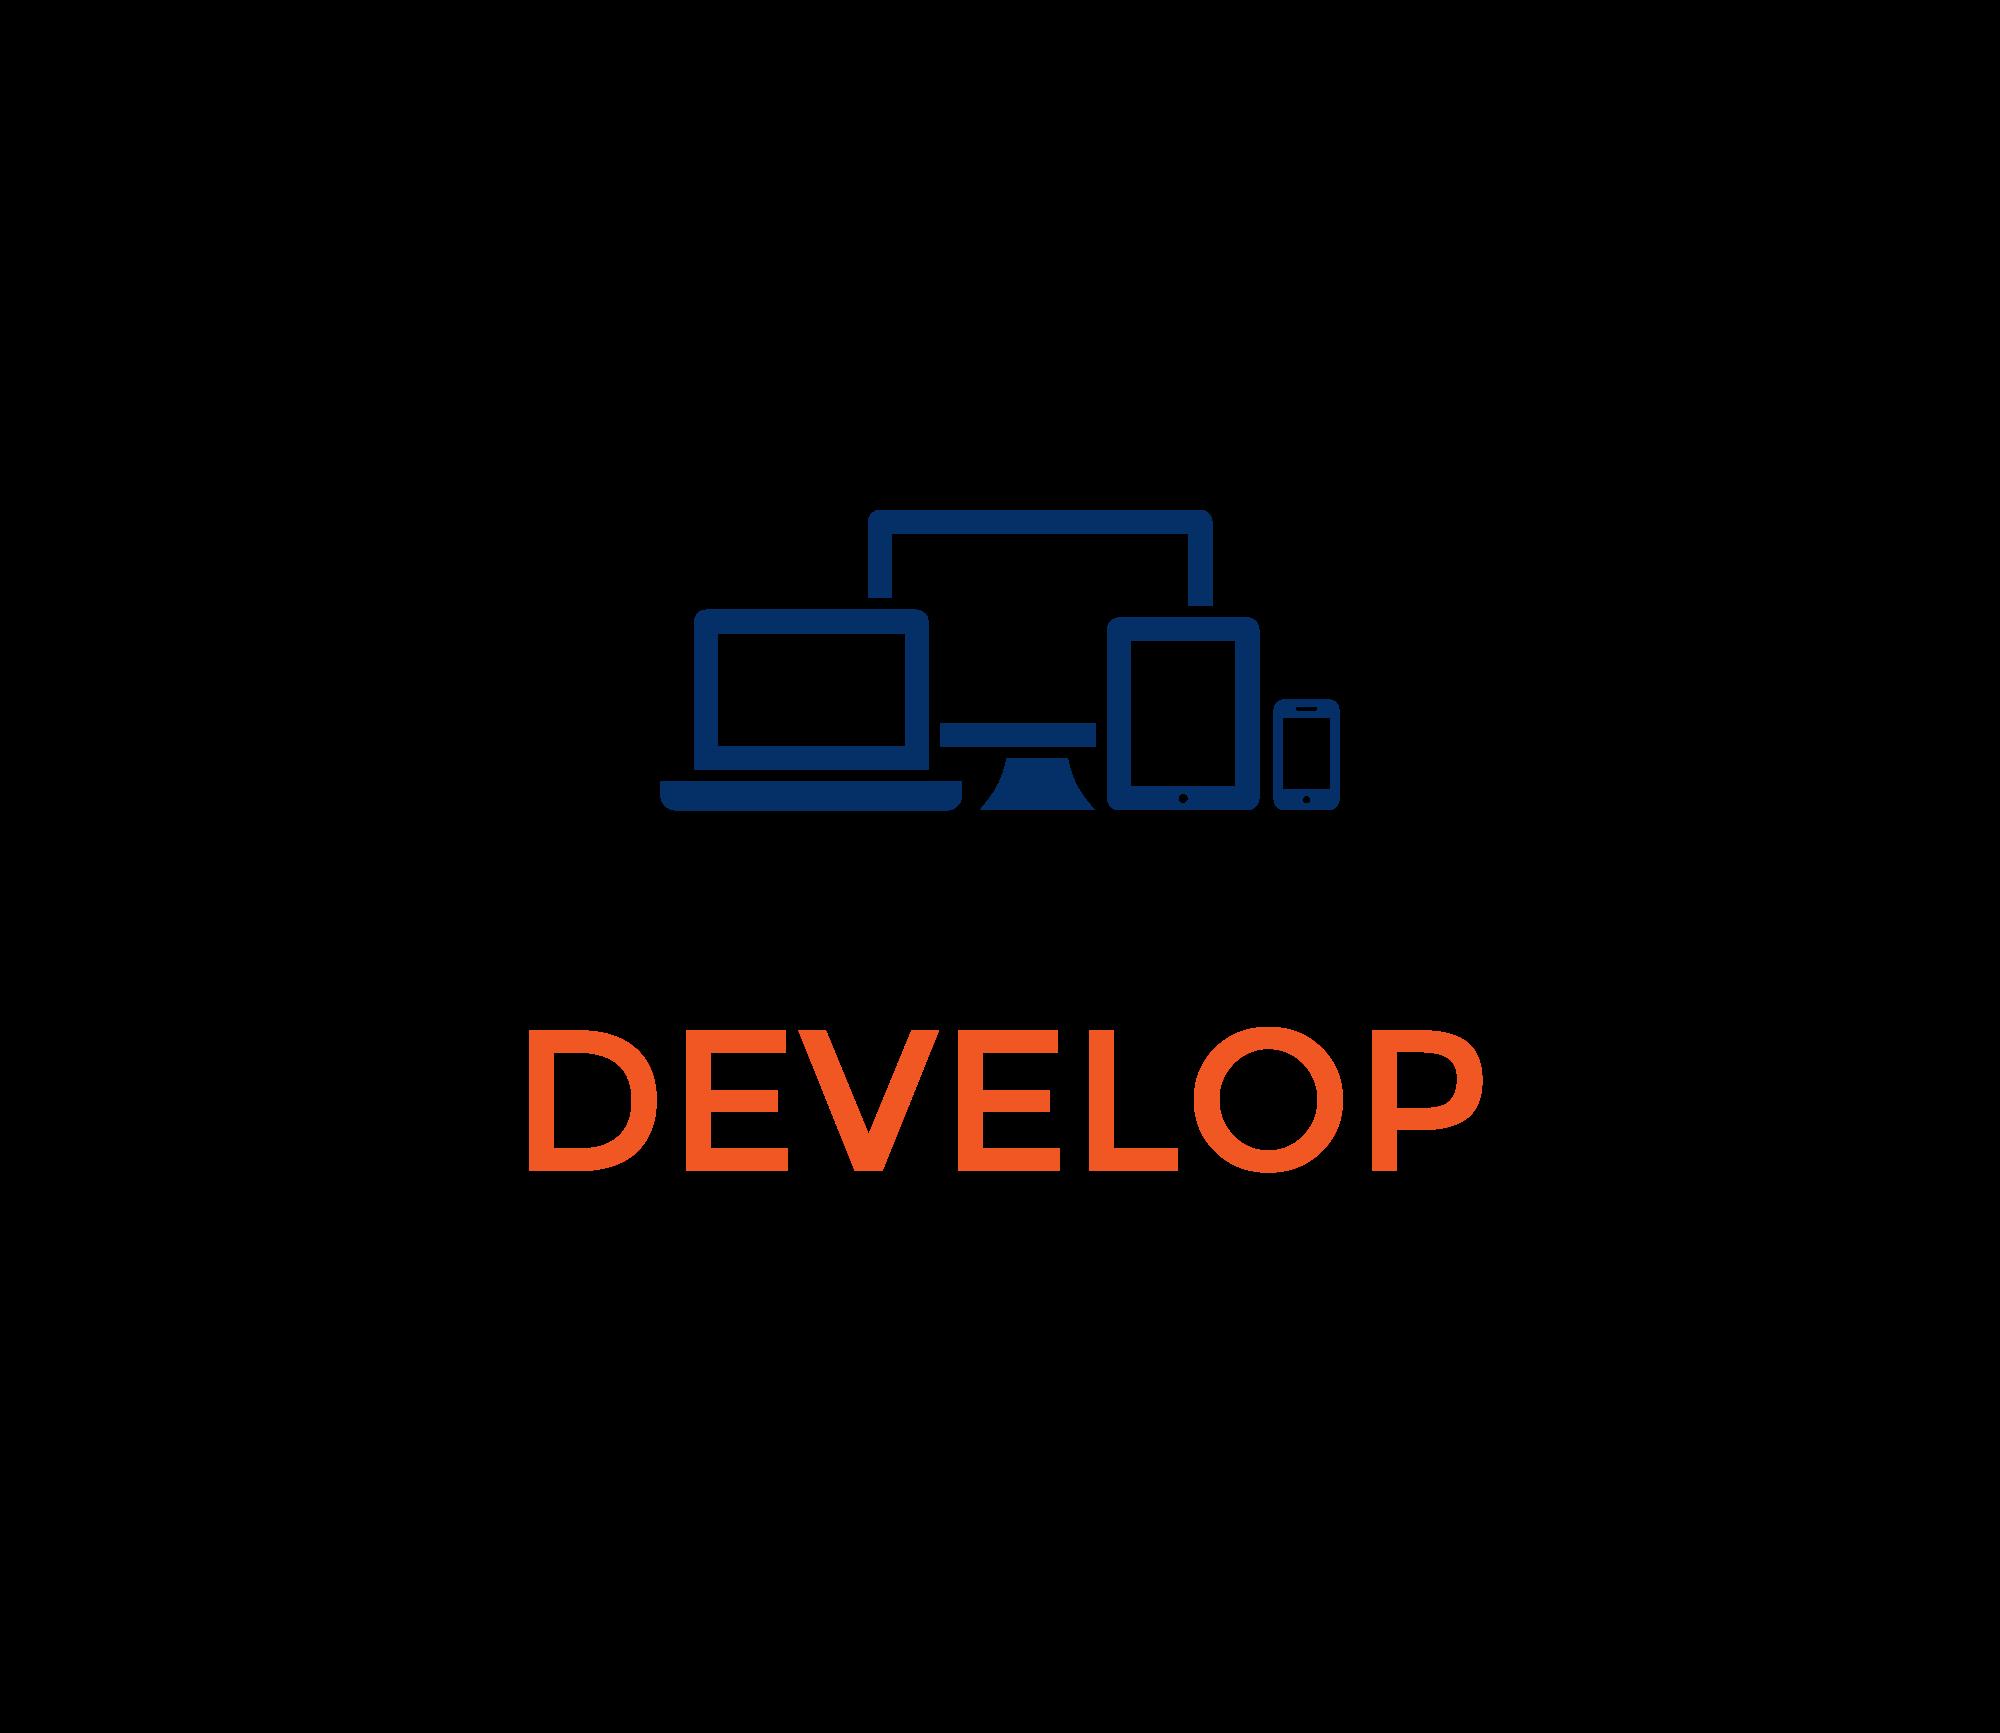 DEVELOP-logo.png